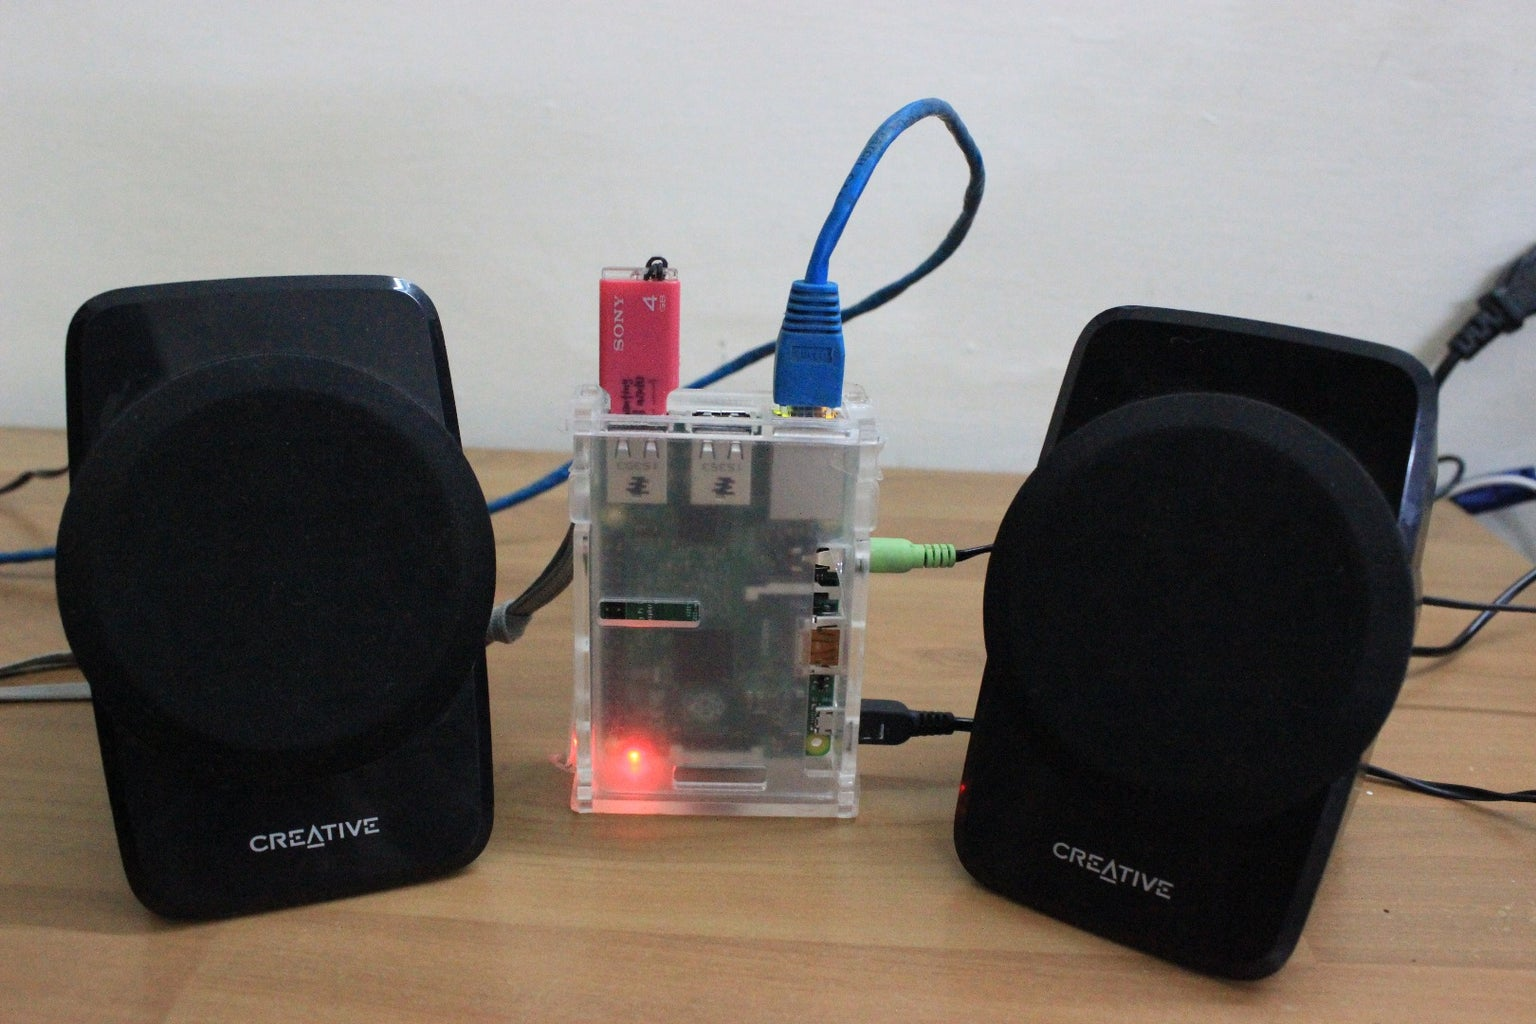 How to Convert Raspberry Pi Into HI FI Audio System Using RuneAudio